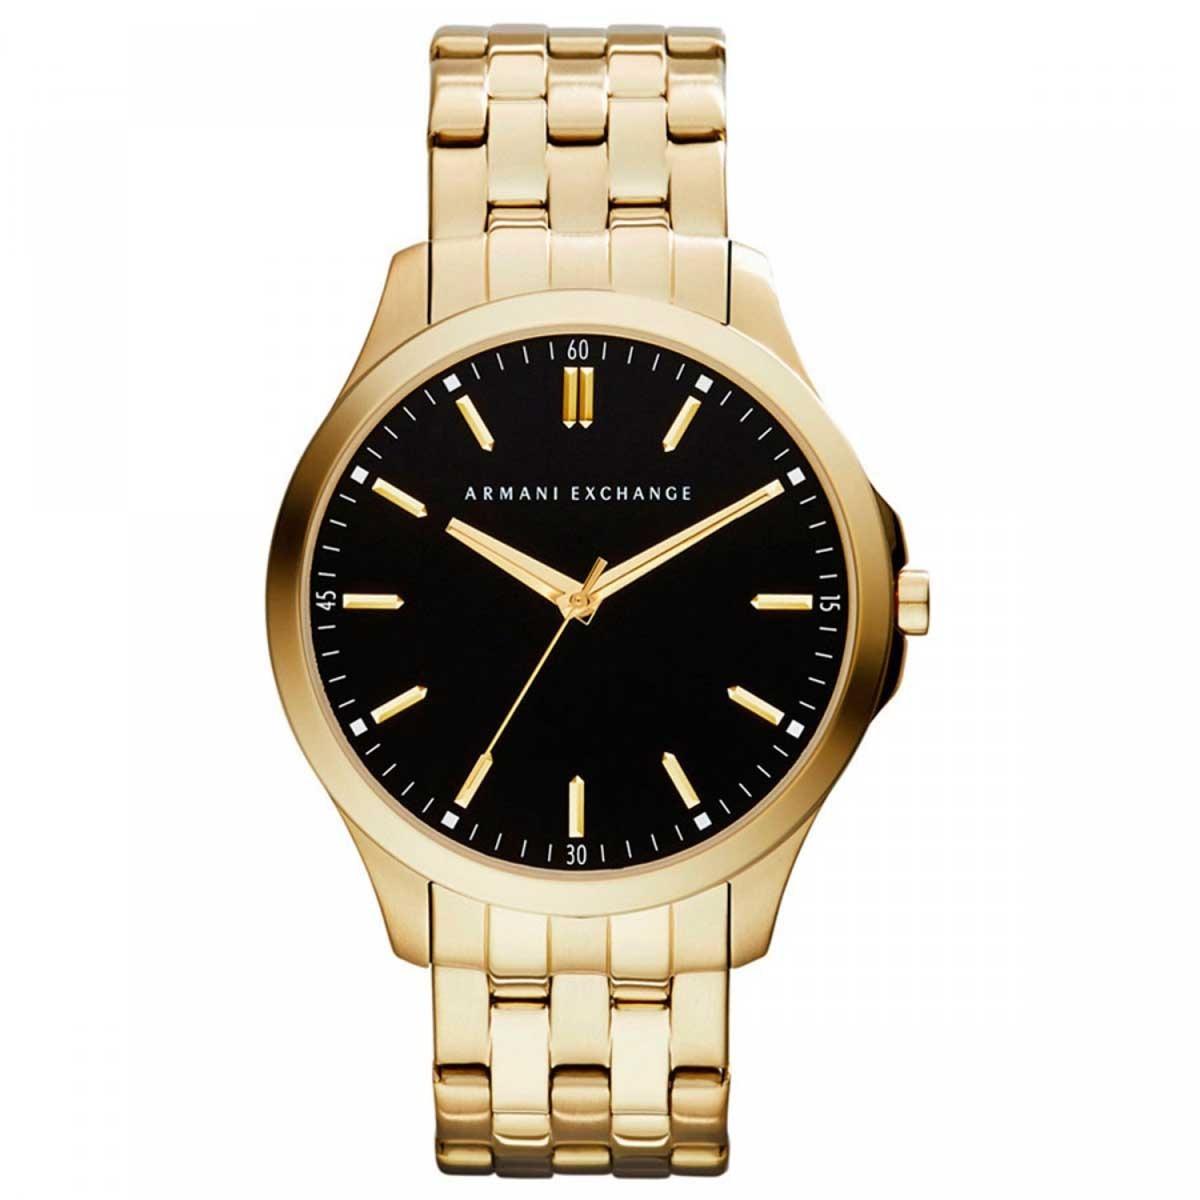 relógio armani exchange masculino dourado analógico ax2145 4. Carregando  zoom. 7a0bd363b6